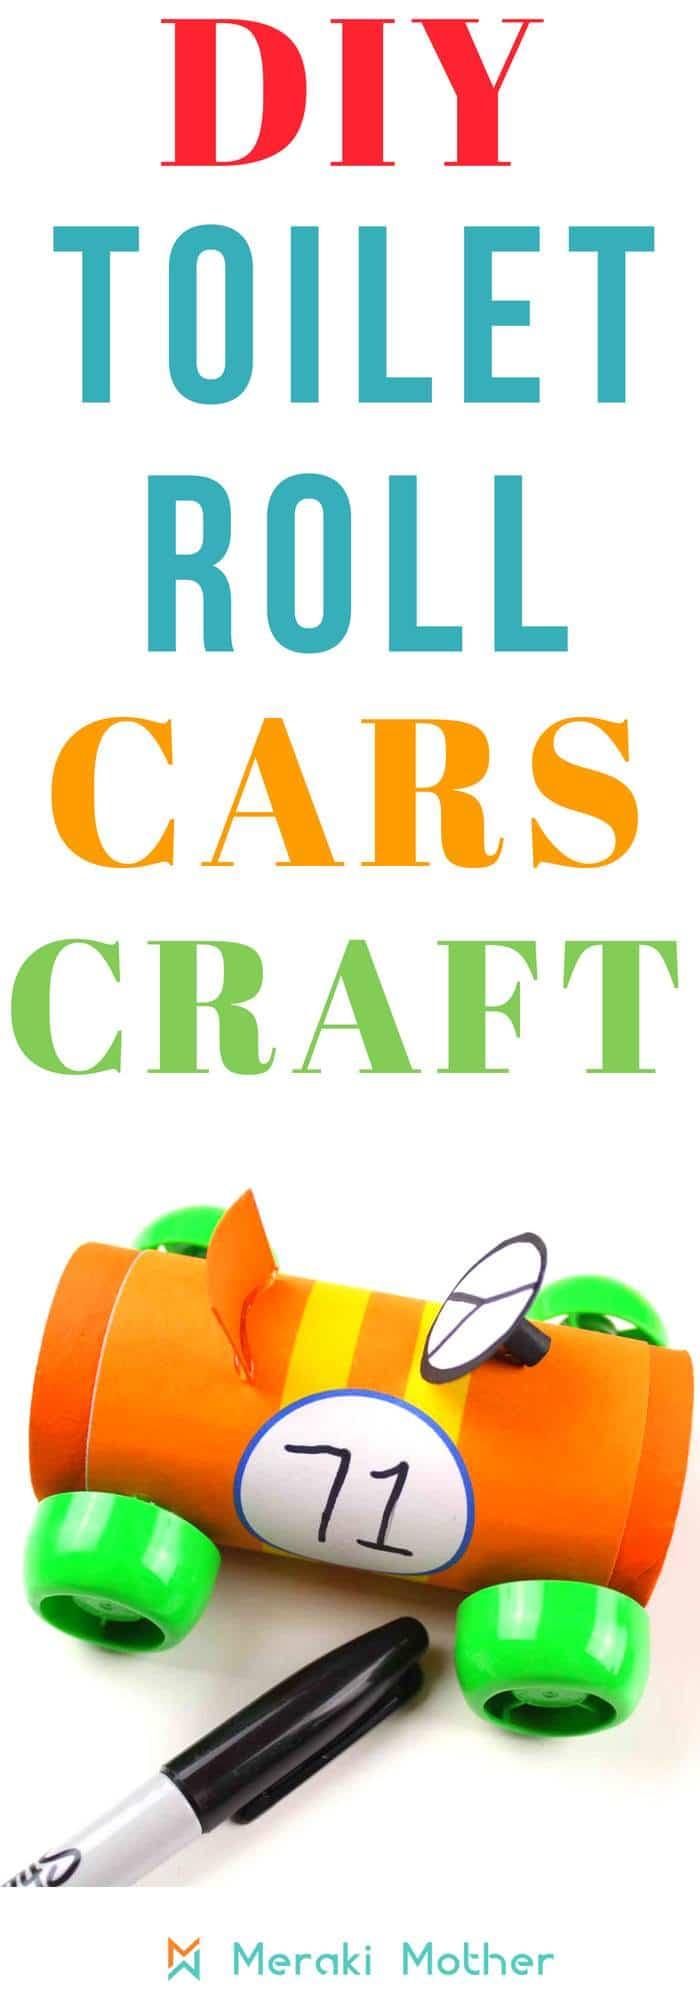 DIY toilet roll cars craft